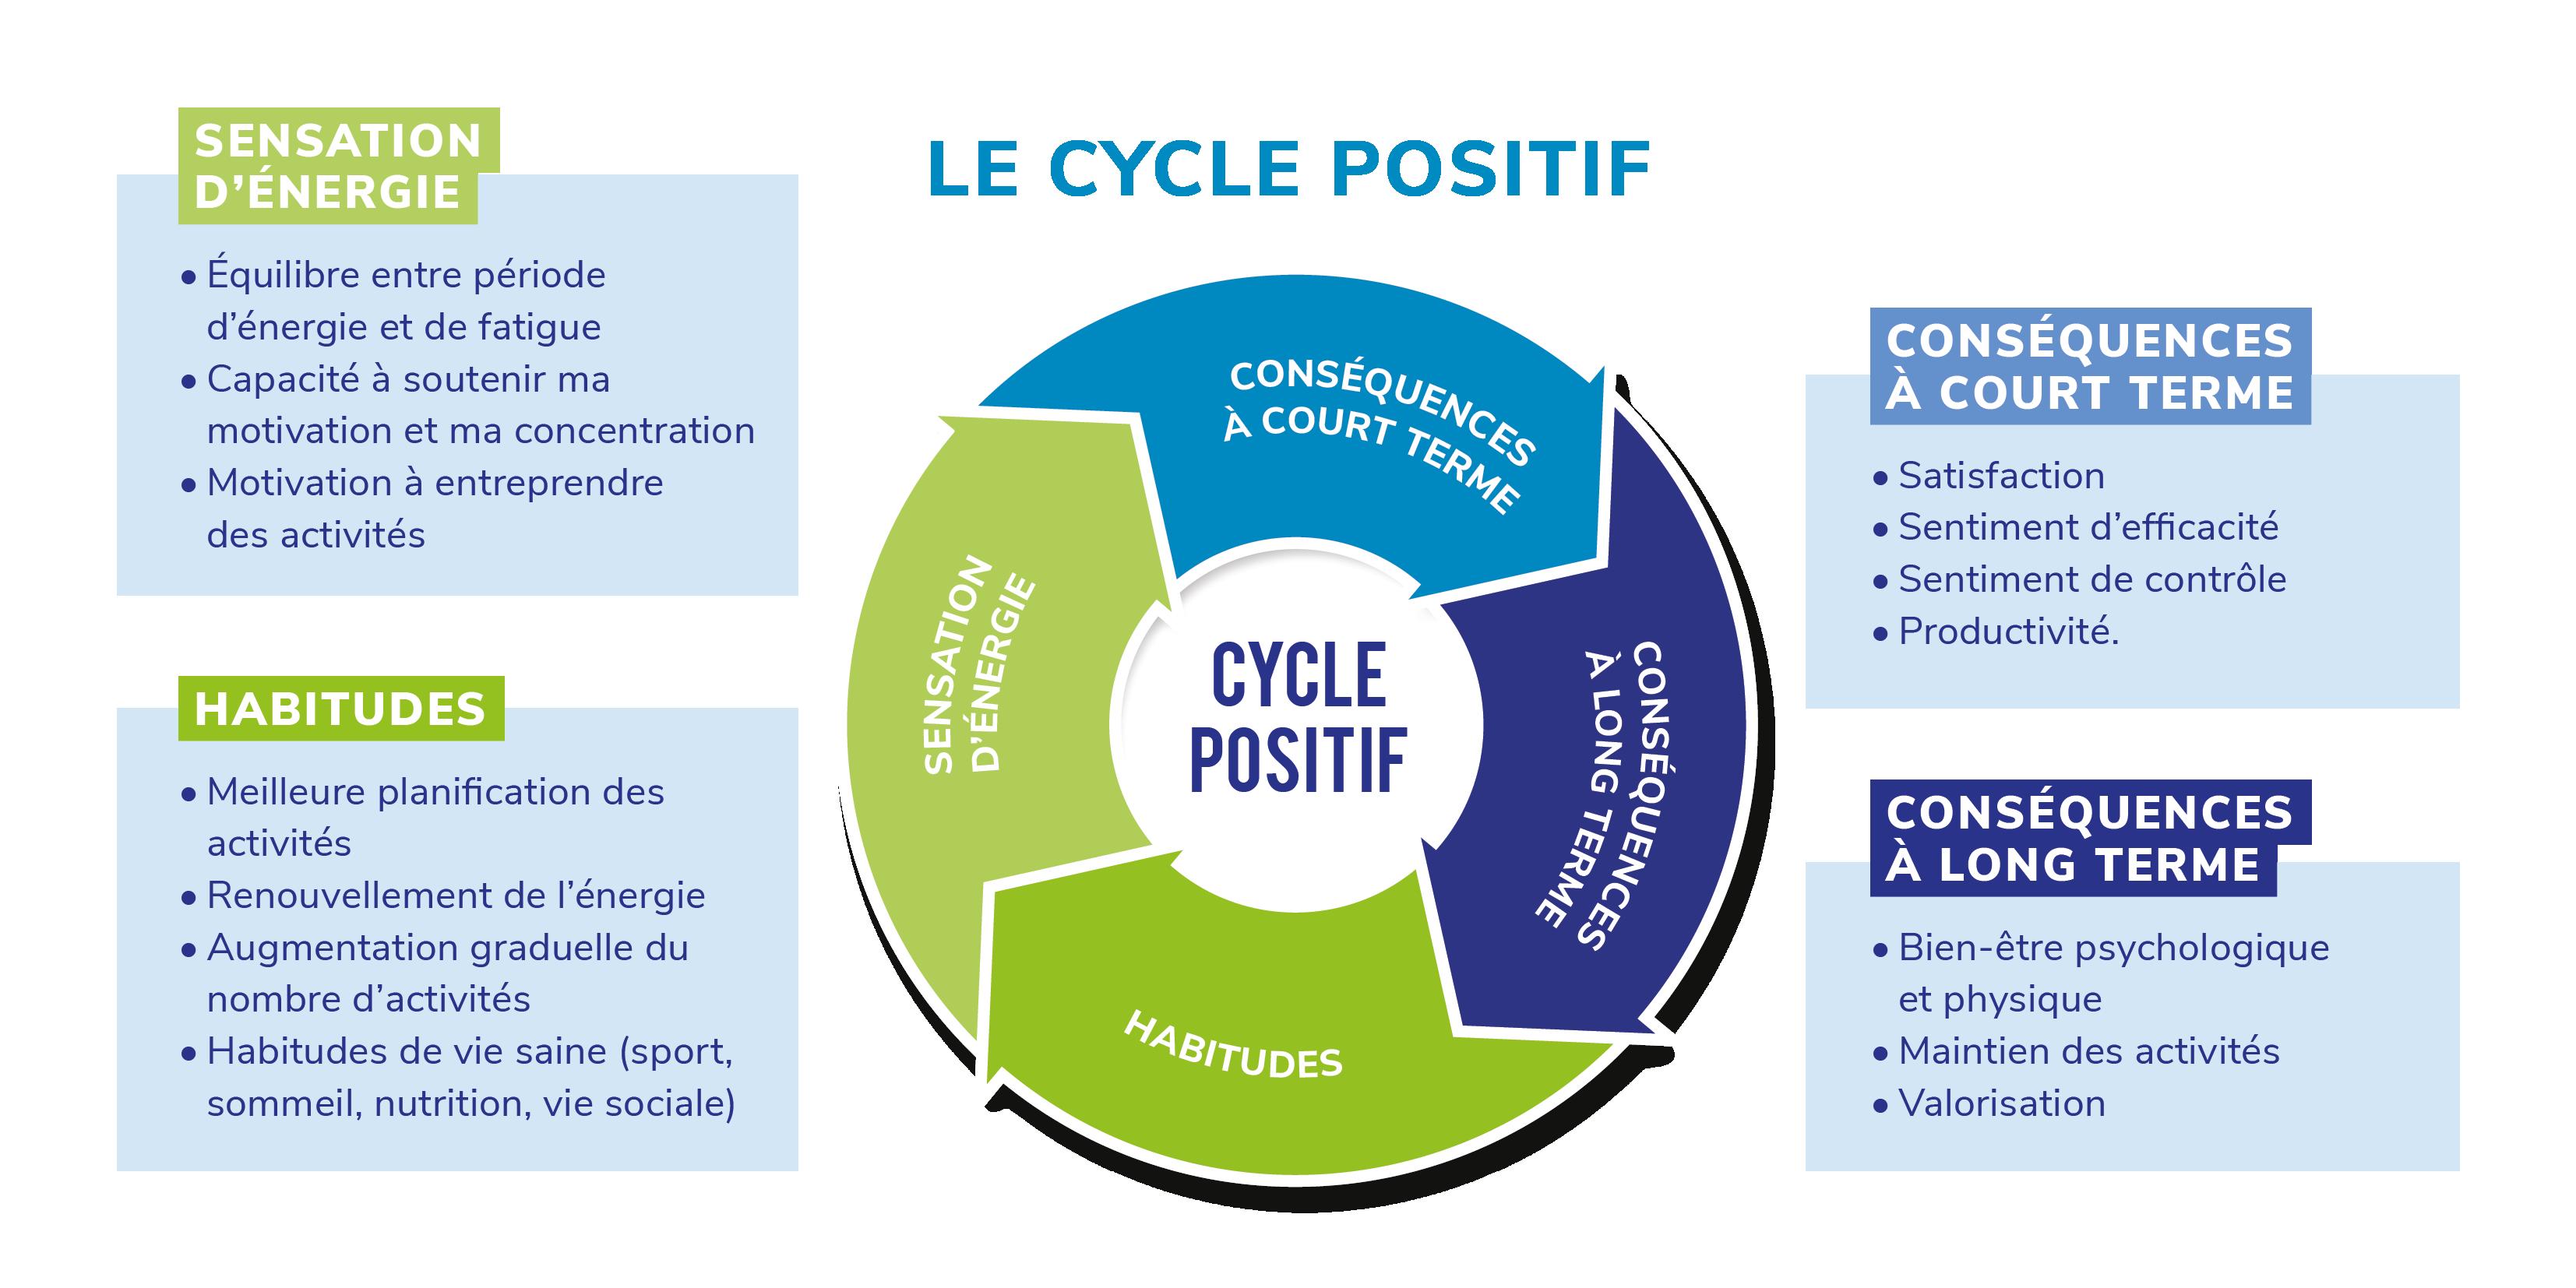 Cycle positif